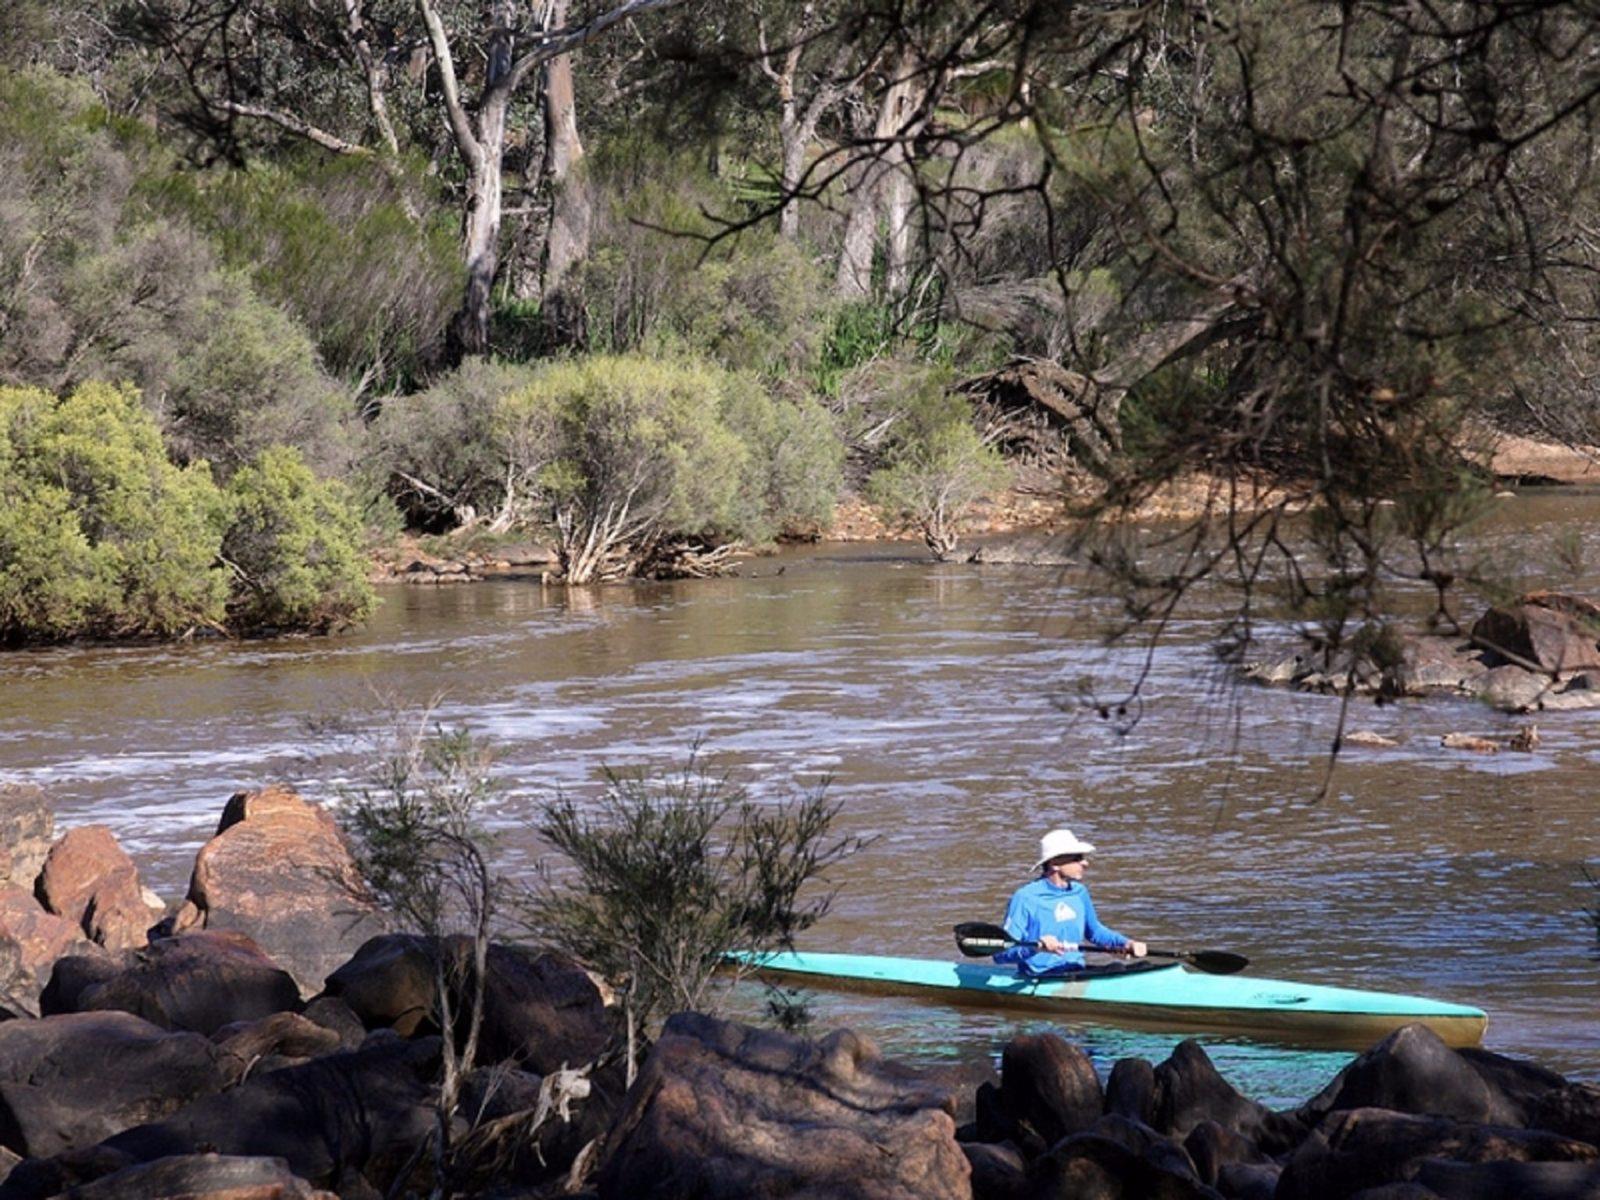 Syd's Rapids and Aboriginal Heritage Trail, Avon Valley, Western Australia